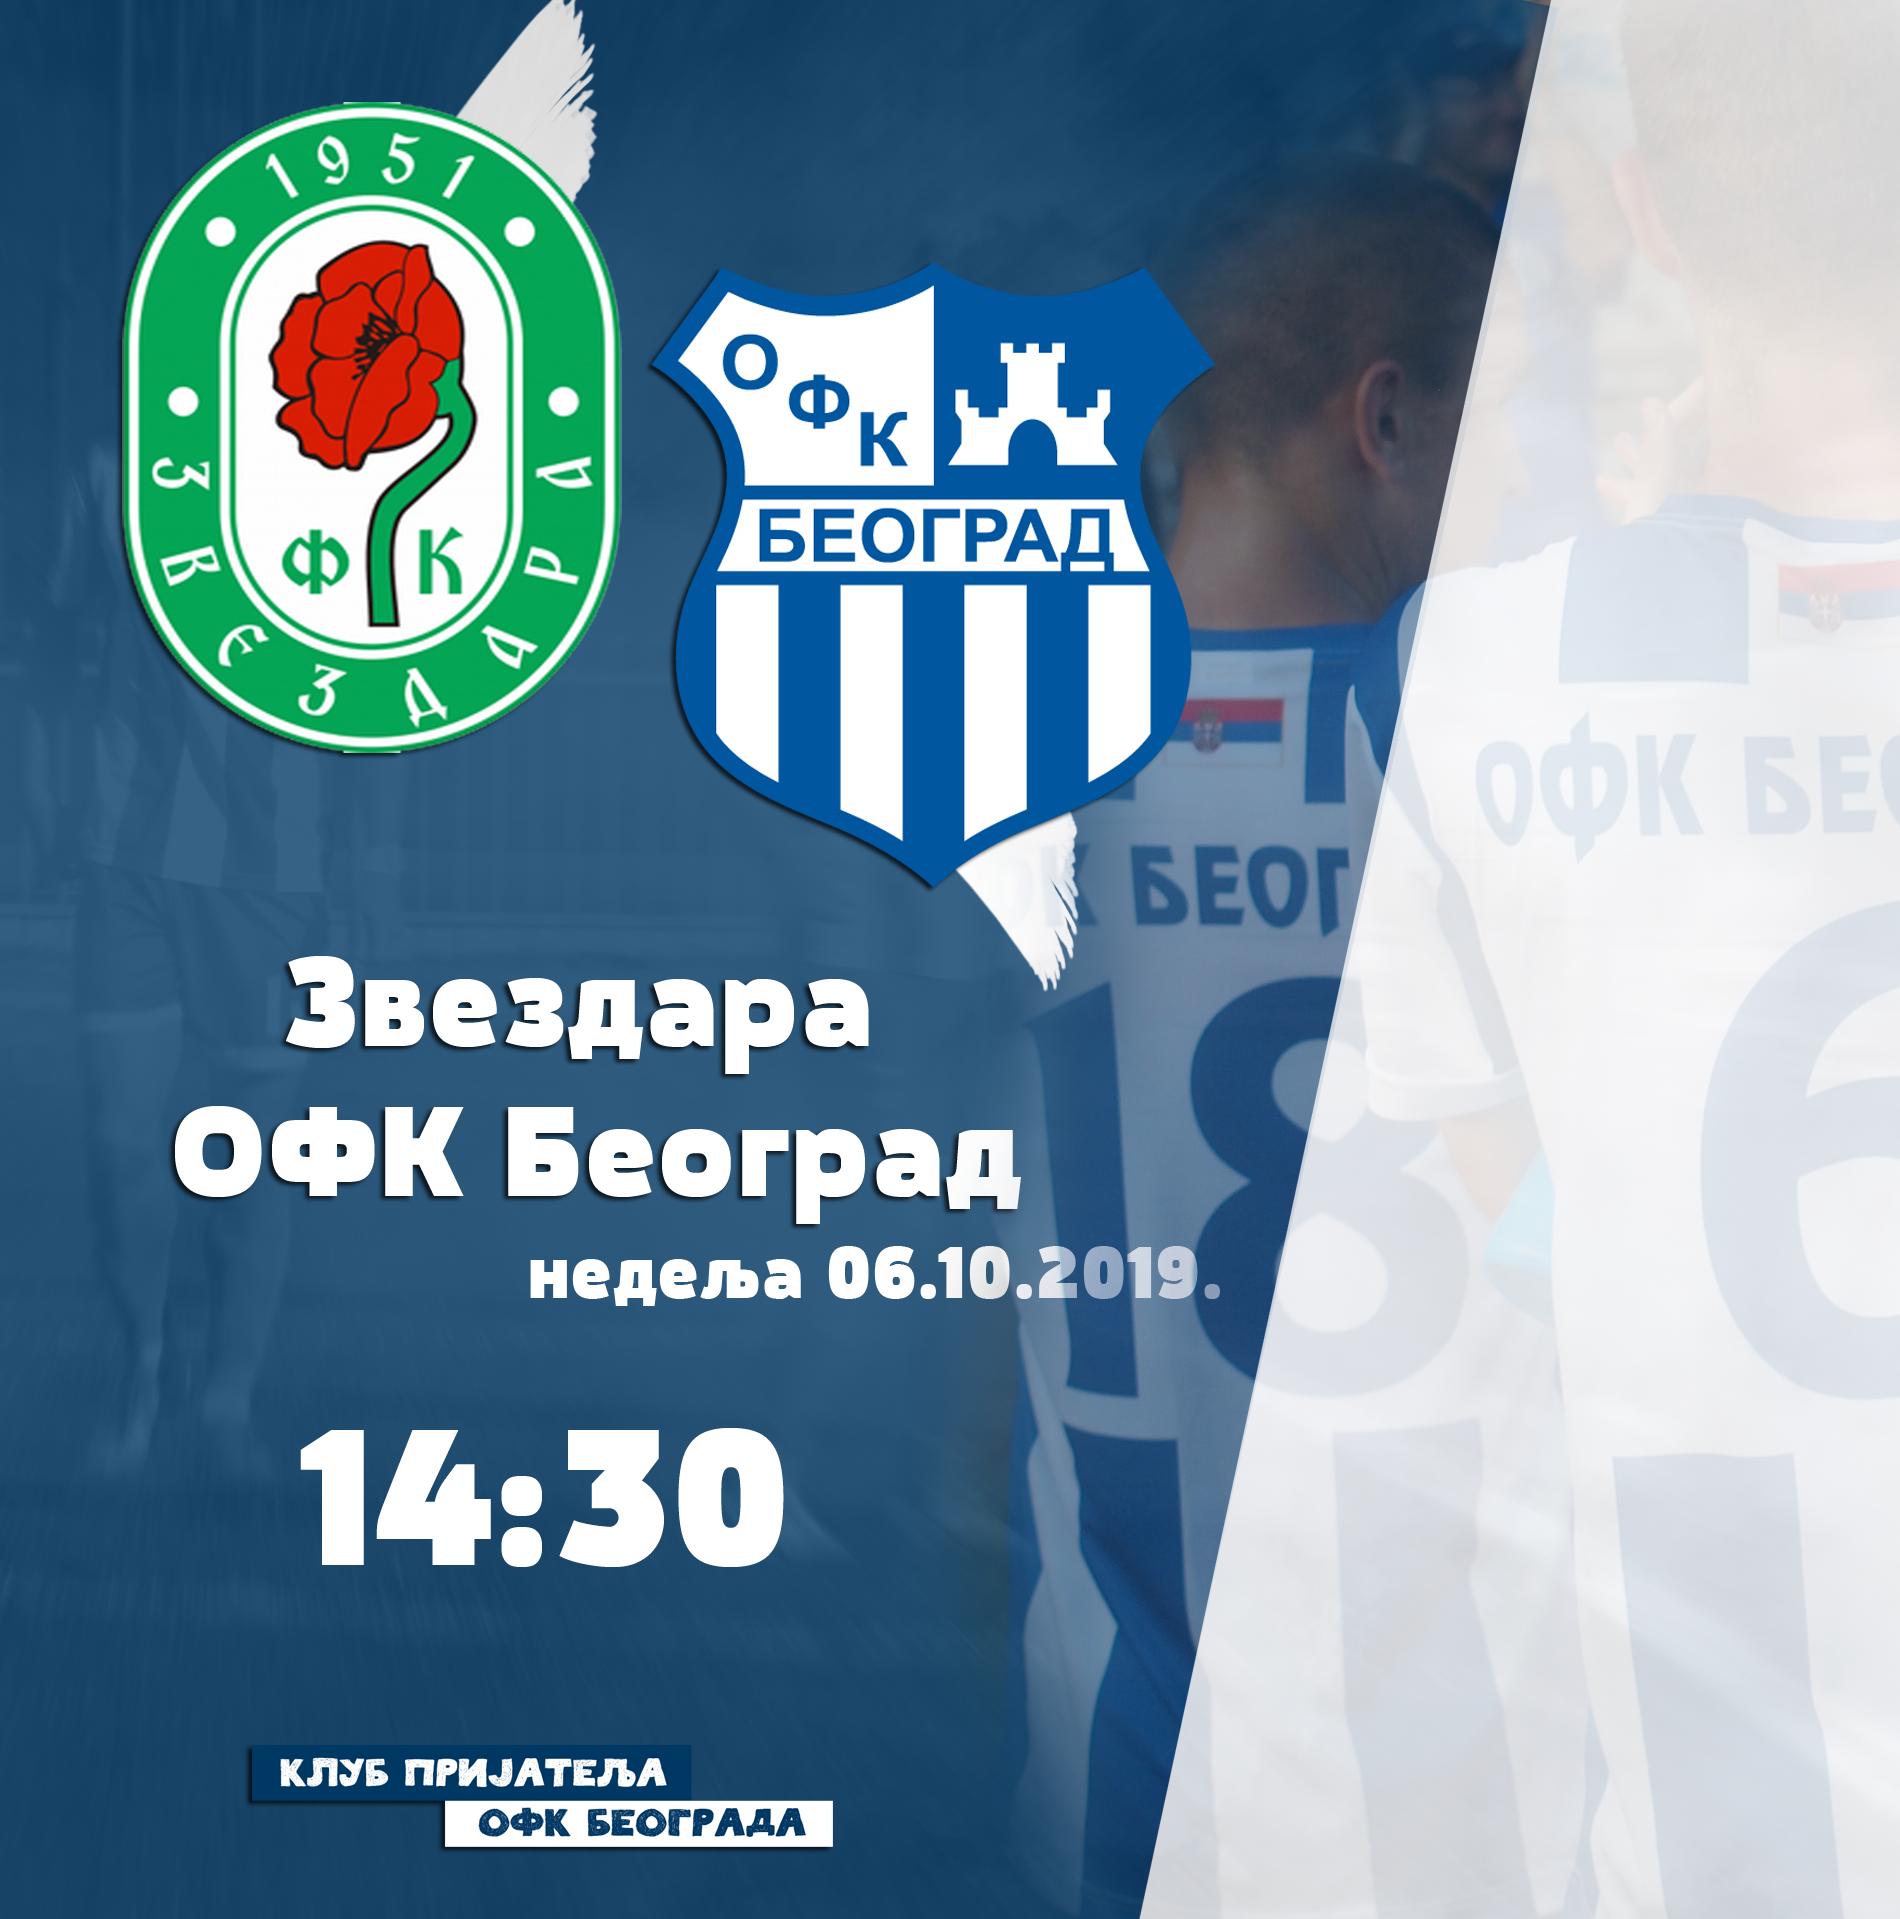 Фудбалски дуел на Звездари. Недеља 06.10. – 14:30